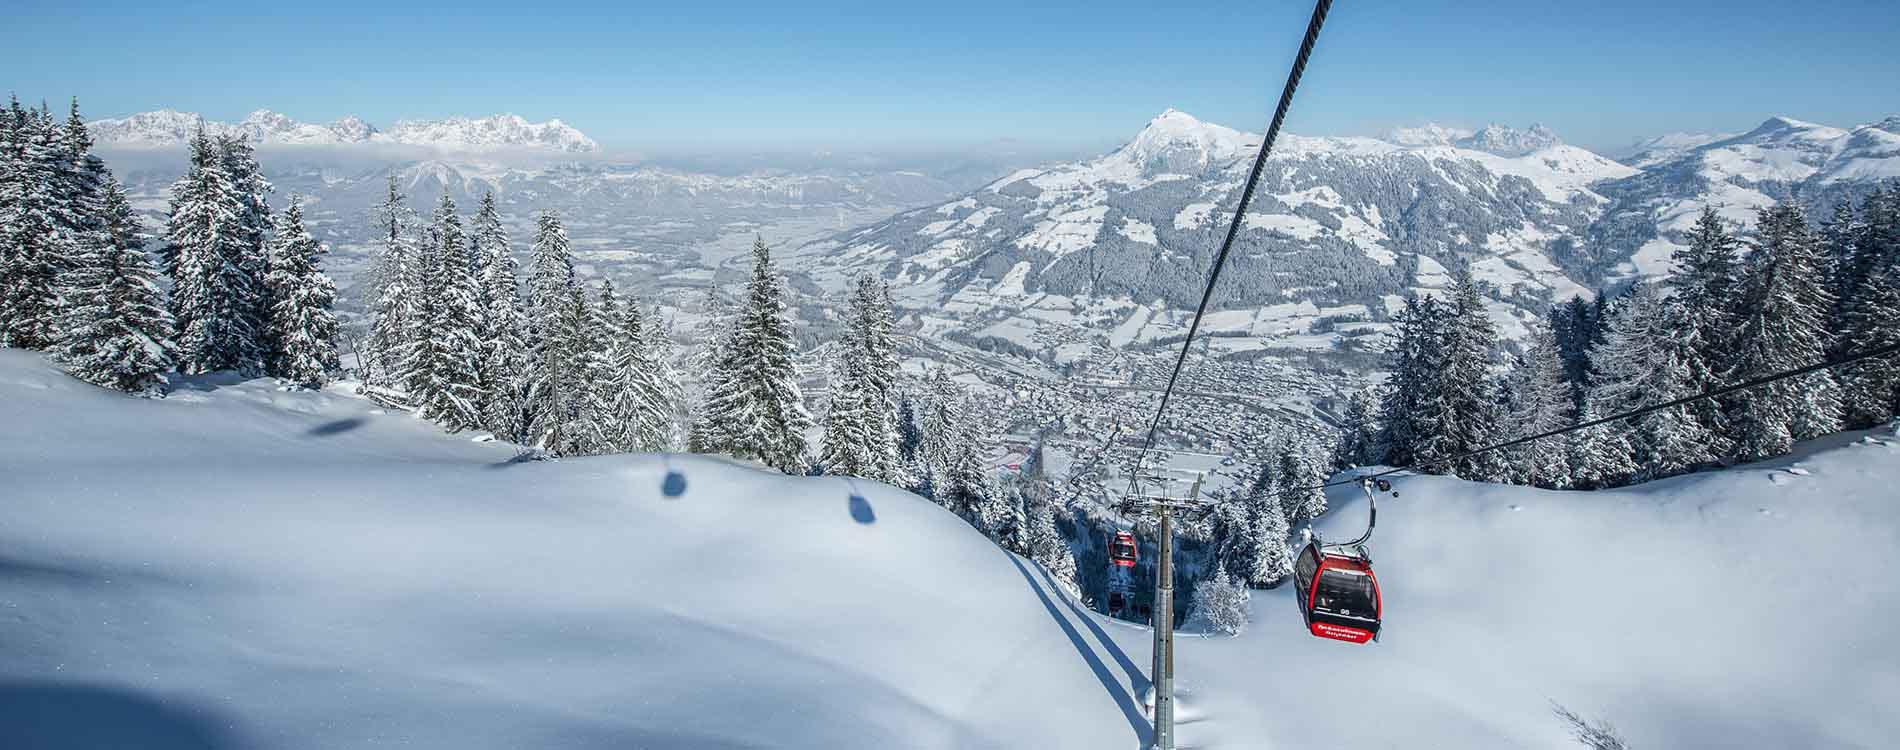 Gourmet ski galore Hotel Rosengarten Kirchberg Tyrol Niche Destinations